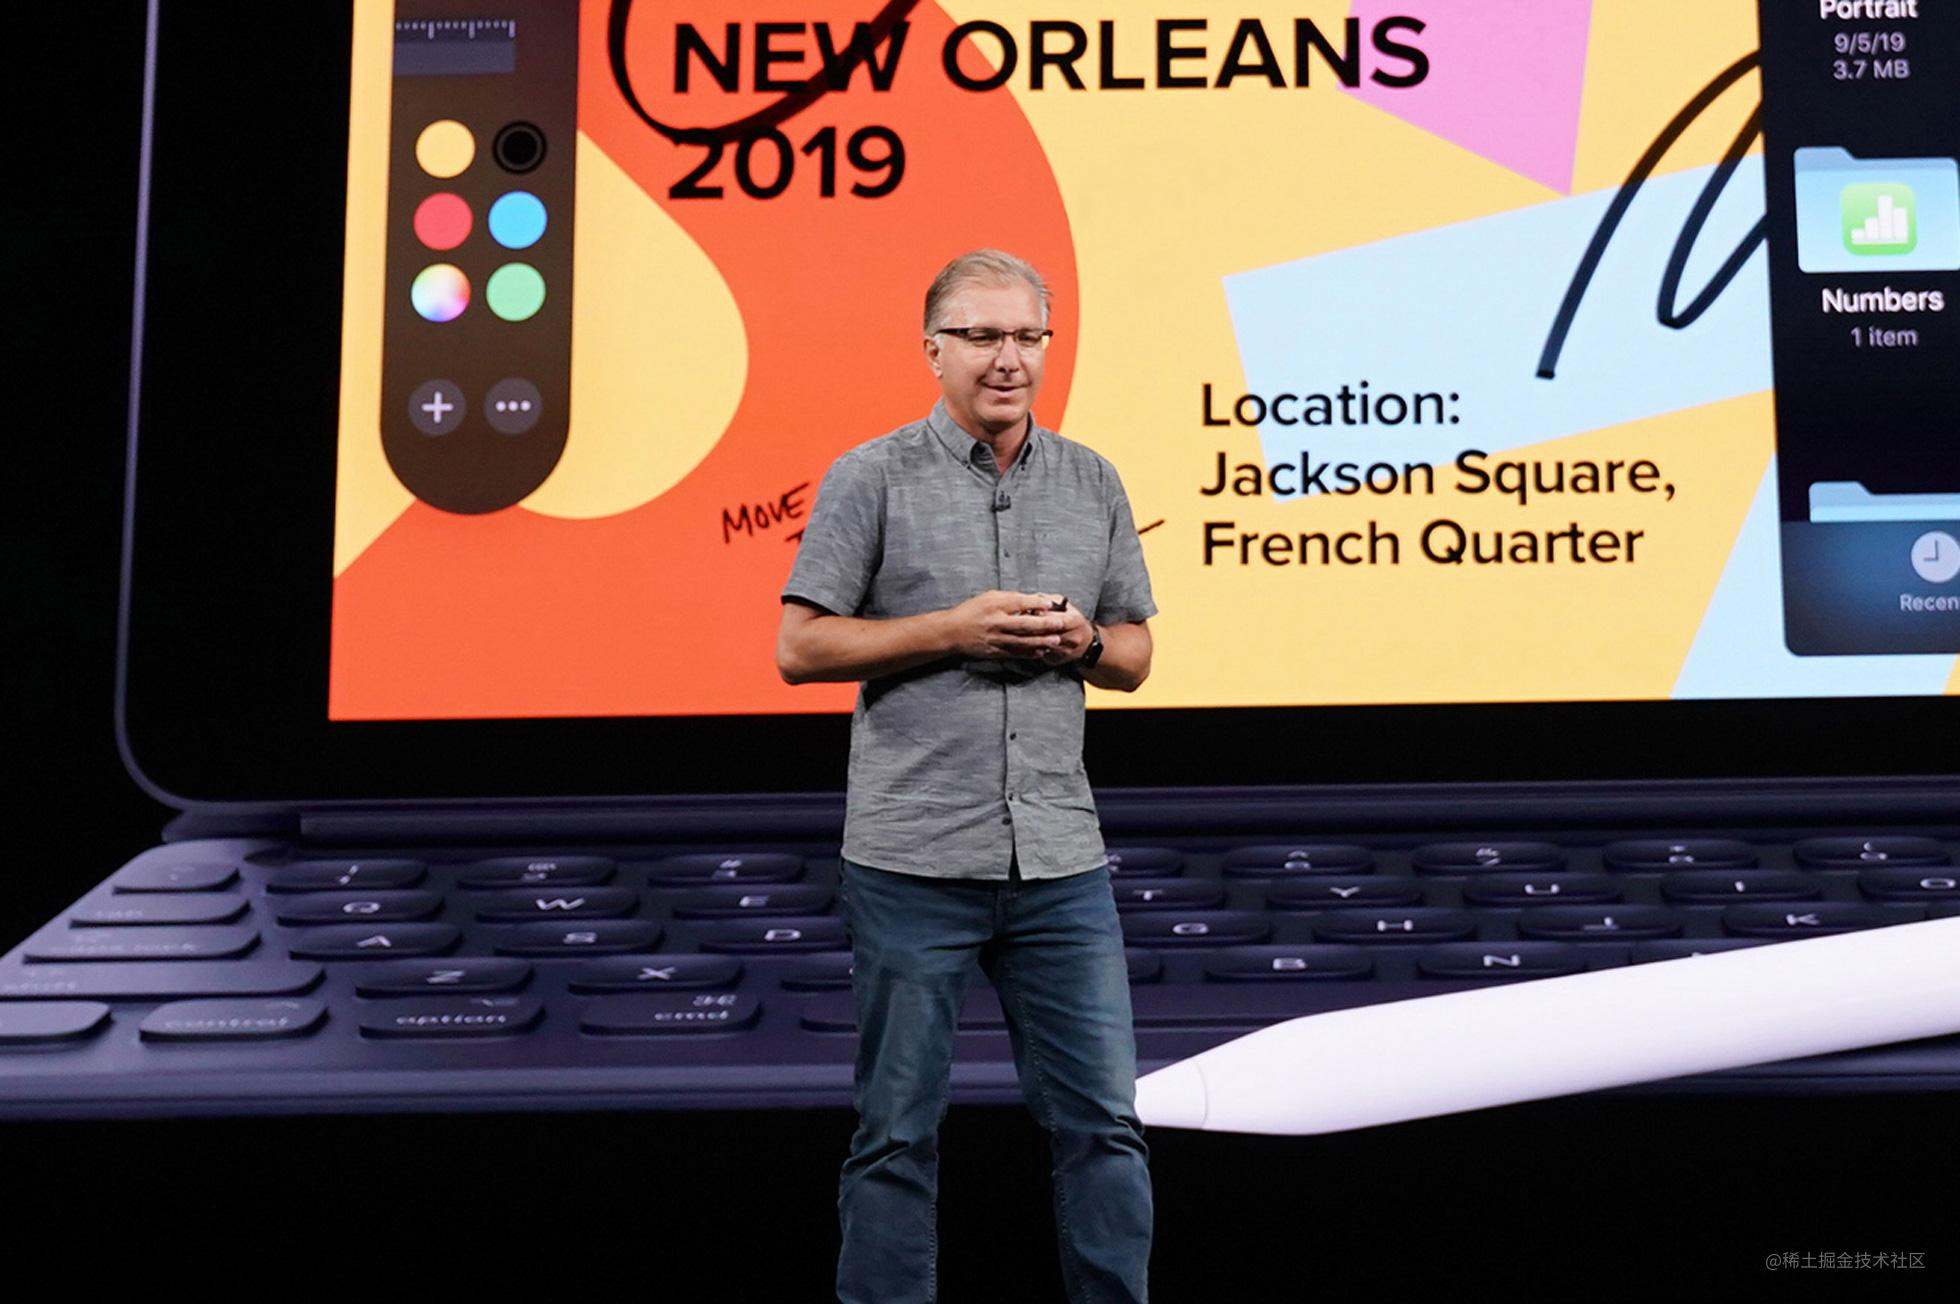 Greg-Joswiak-joins-apple-executive-team-svp-of-worldwide-marketing.jpg